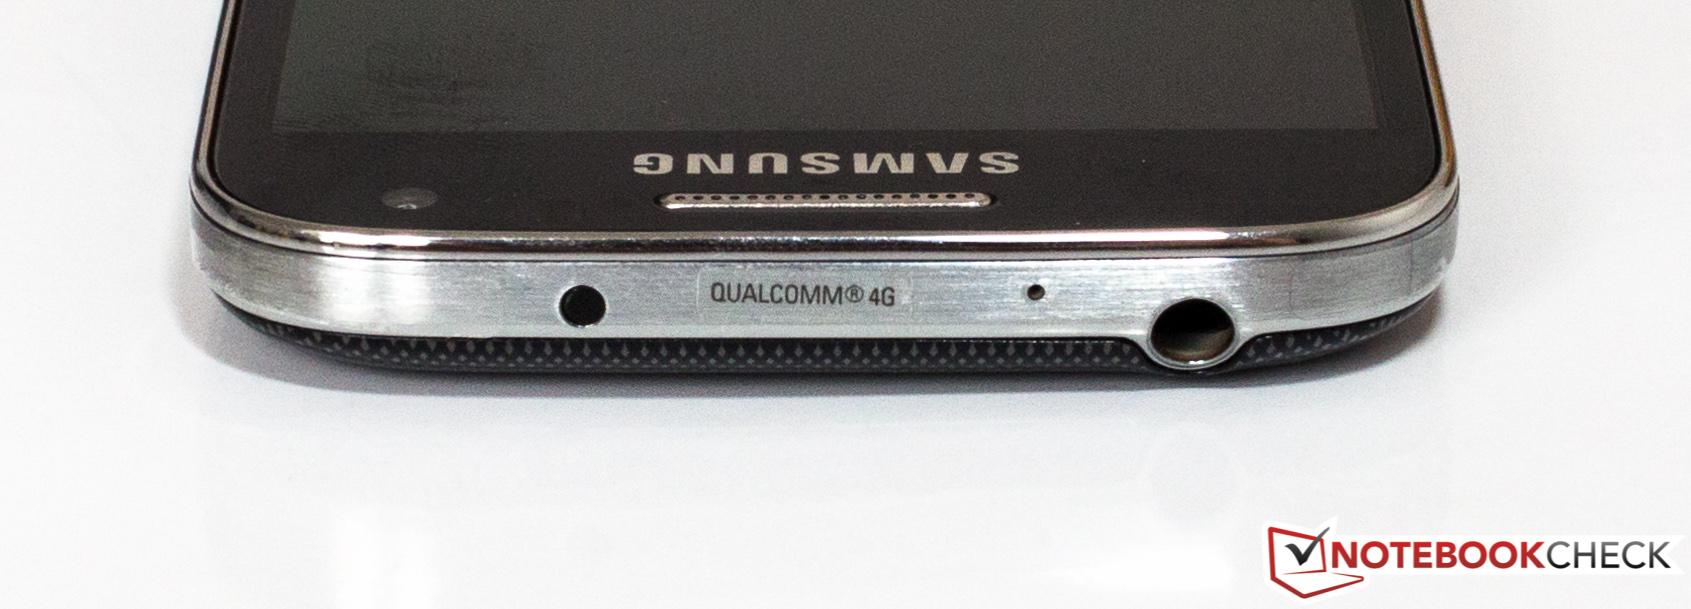 Review Samsung Galaxy S4 Mini GT-I9195 Smartphone